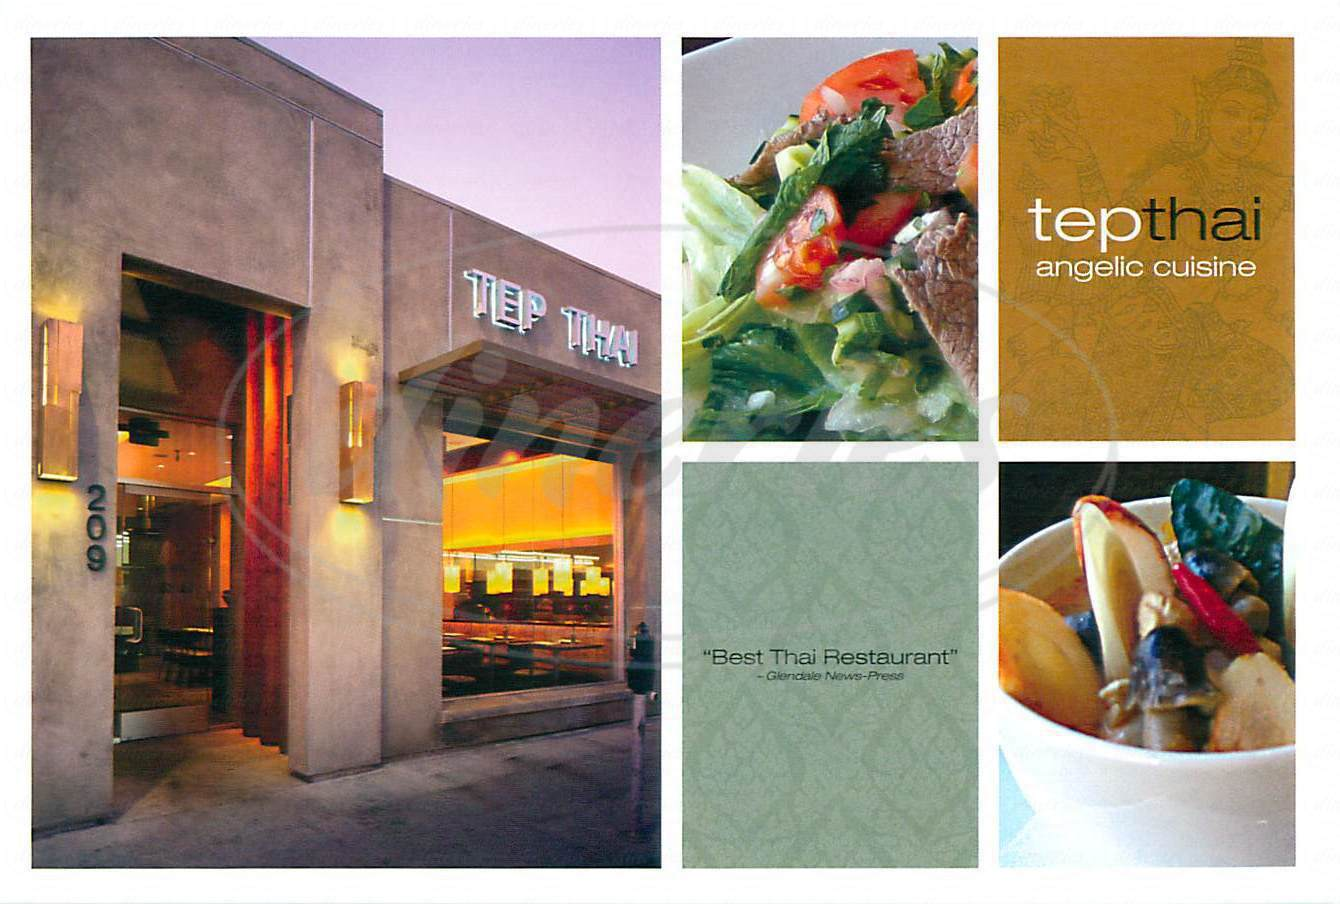 menu for Tep Thai